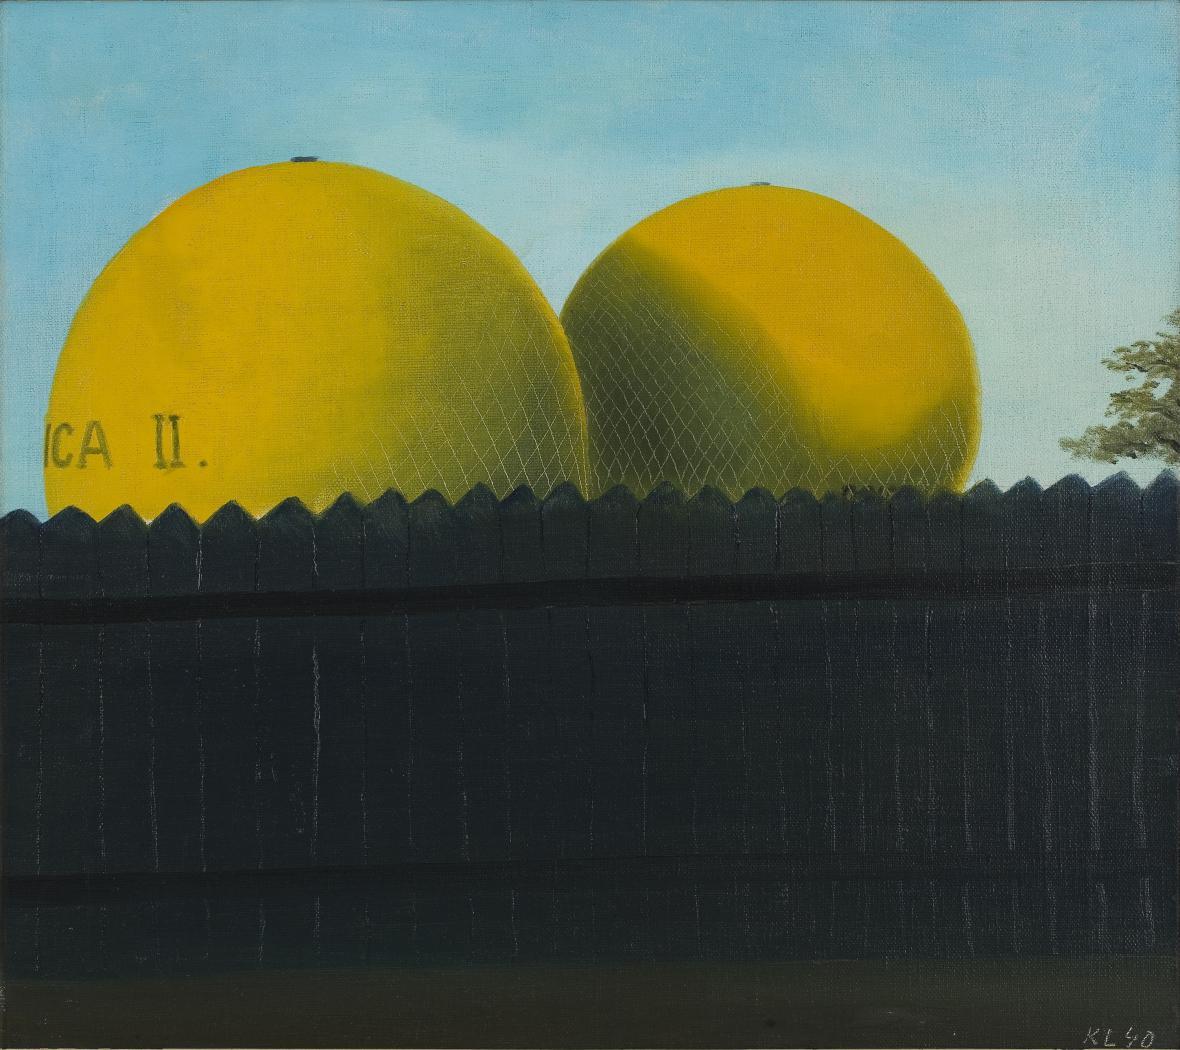 Kamil Lhoták / Dva balony za ohradou, olej na plátně, 1940